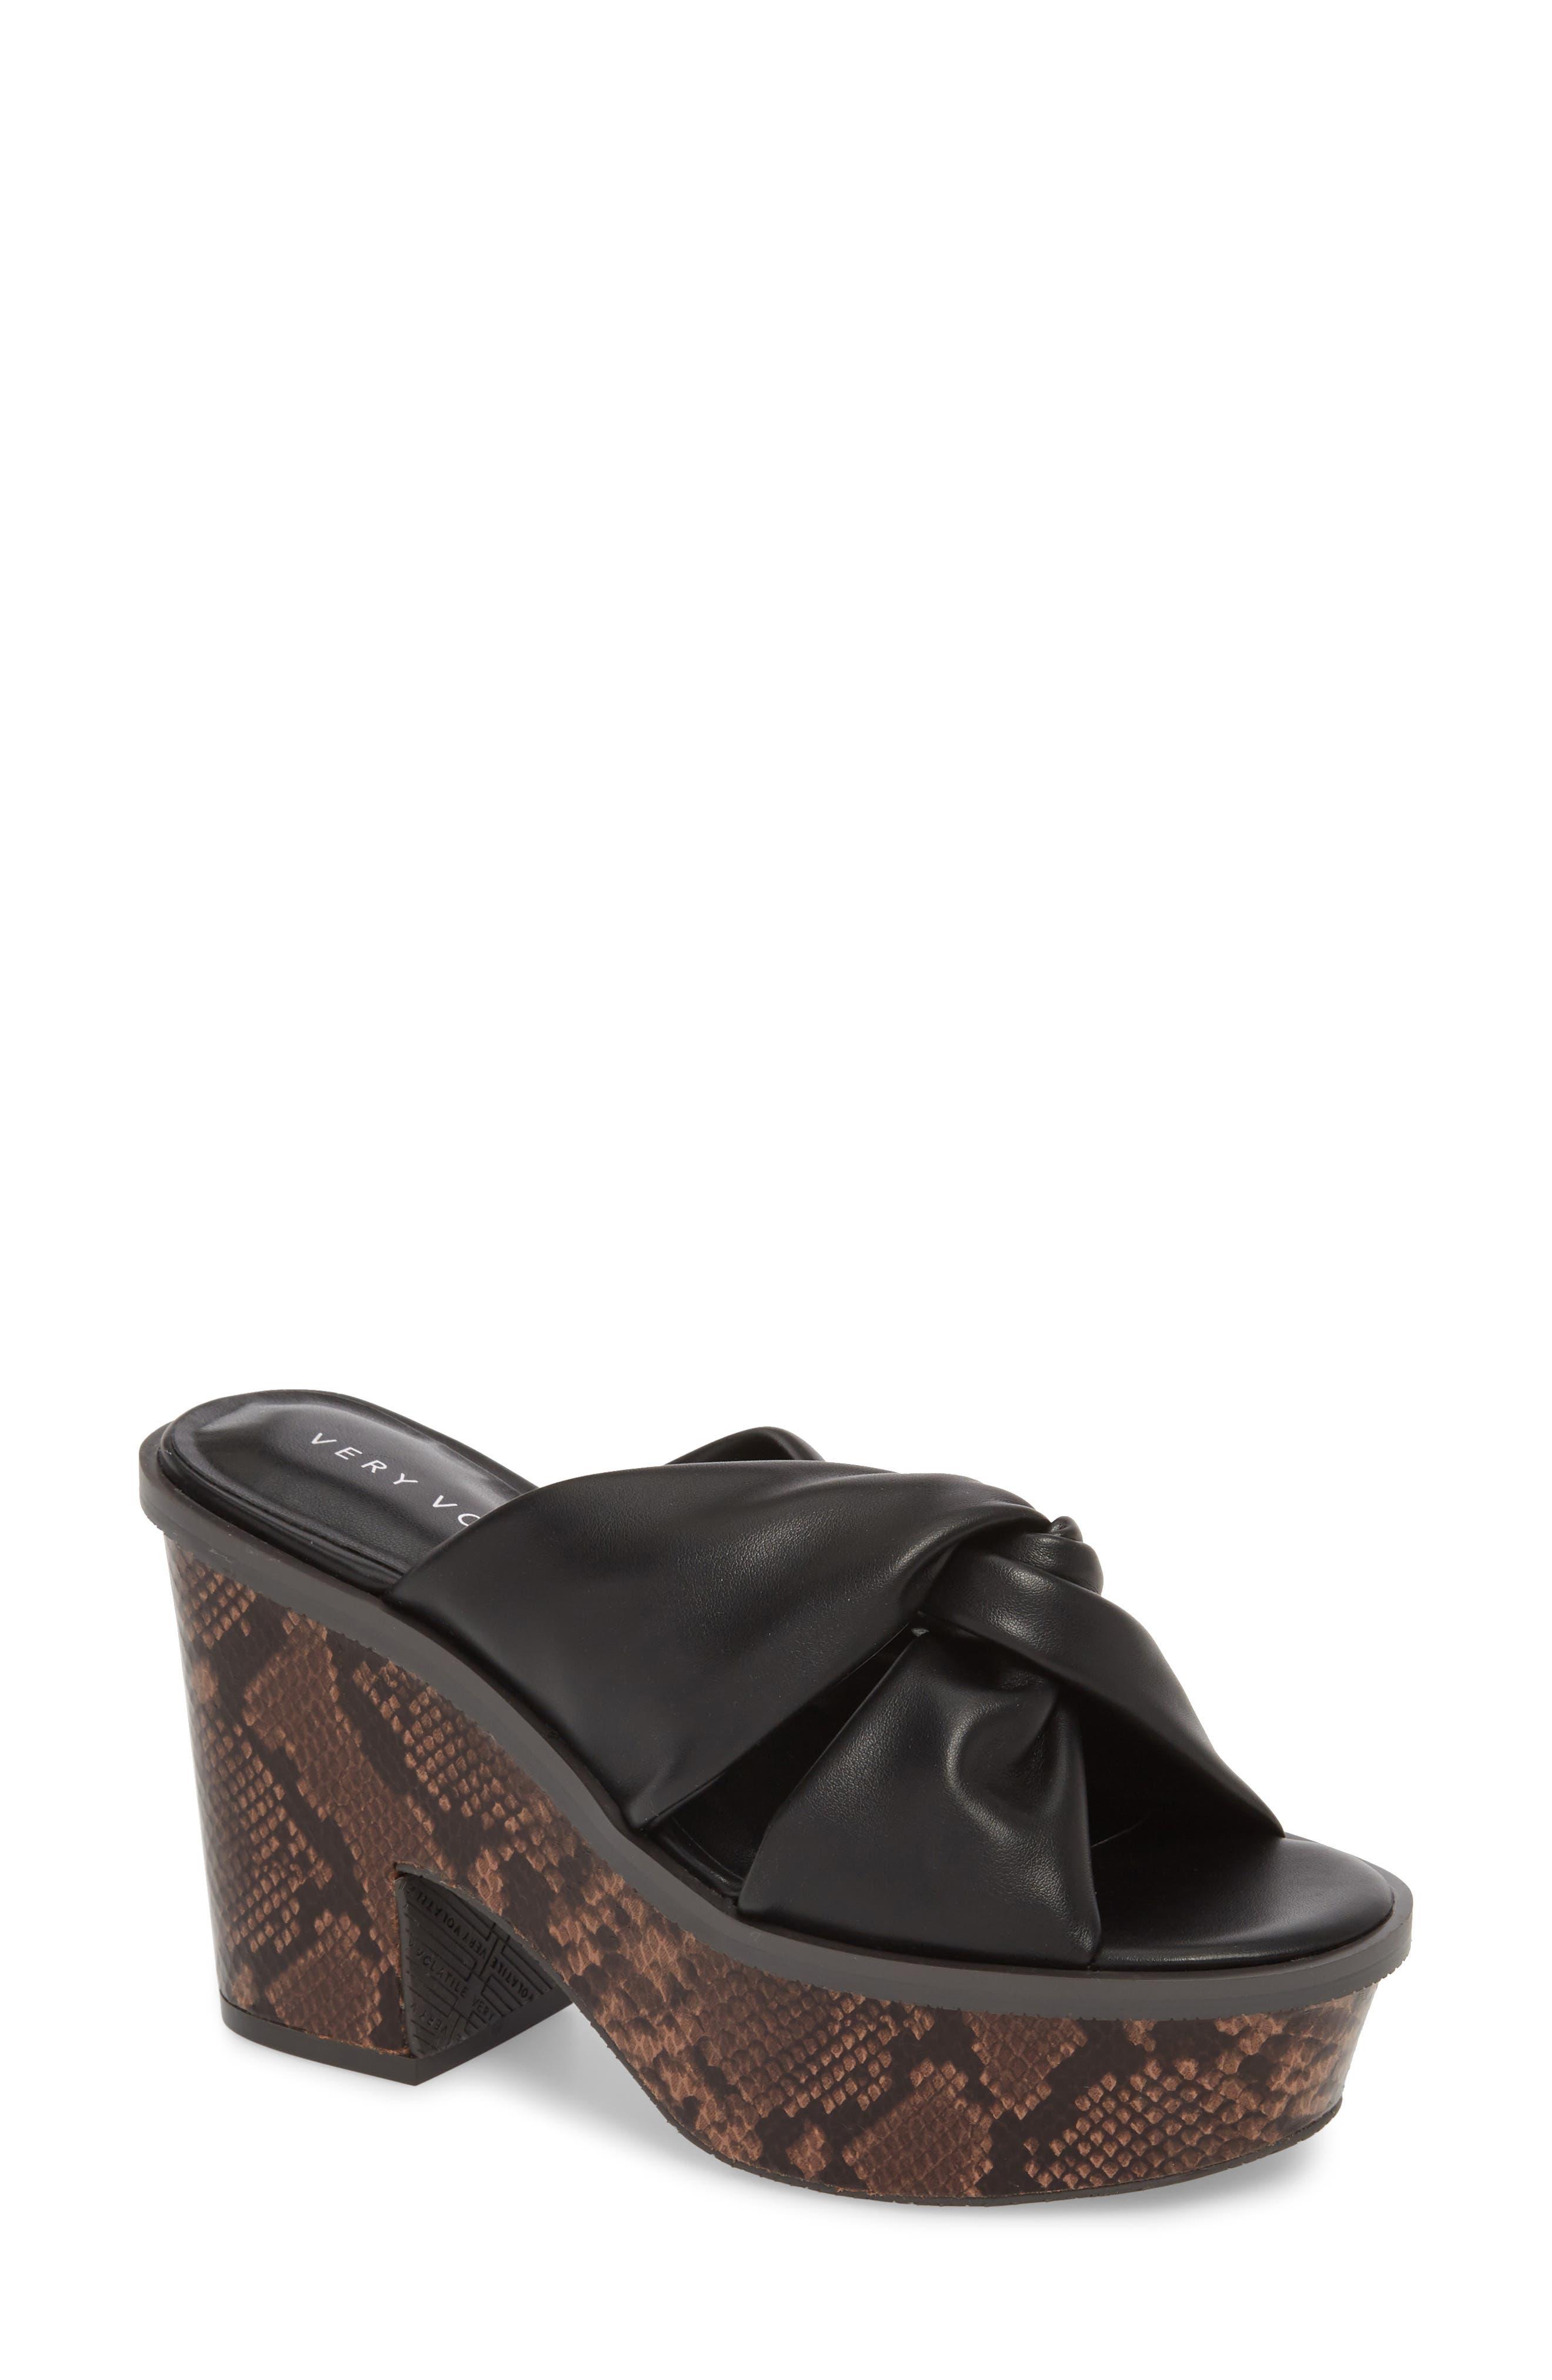 60ae165a08b8 Women s Very Volatile Sandals